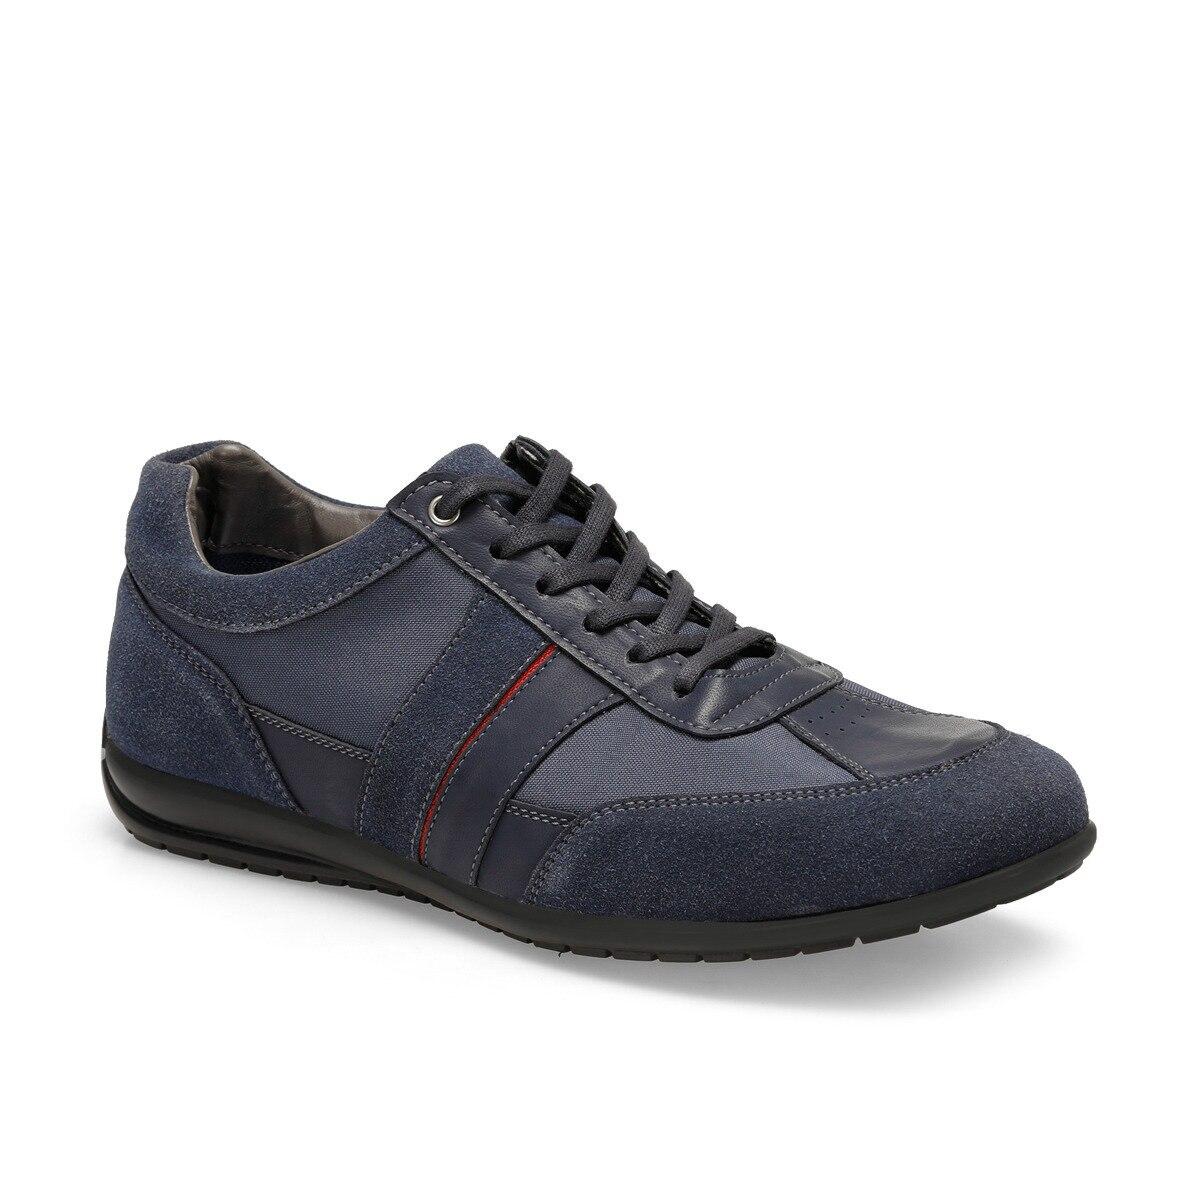 FLO NAVIA C Black Men 'S Sneaker Shoes Oxide